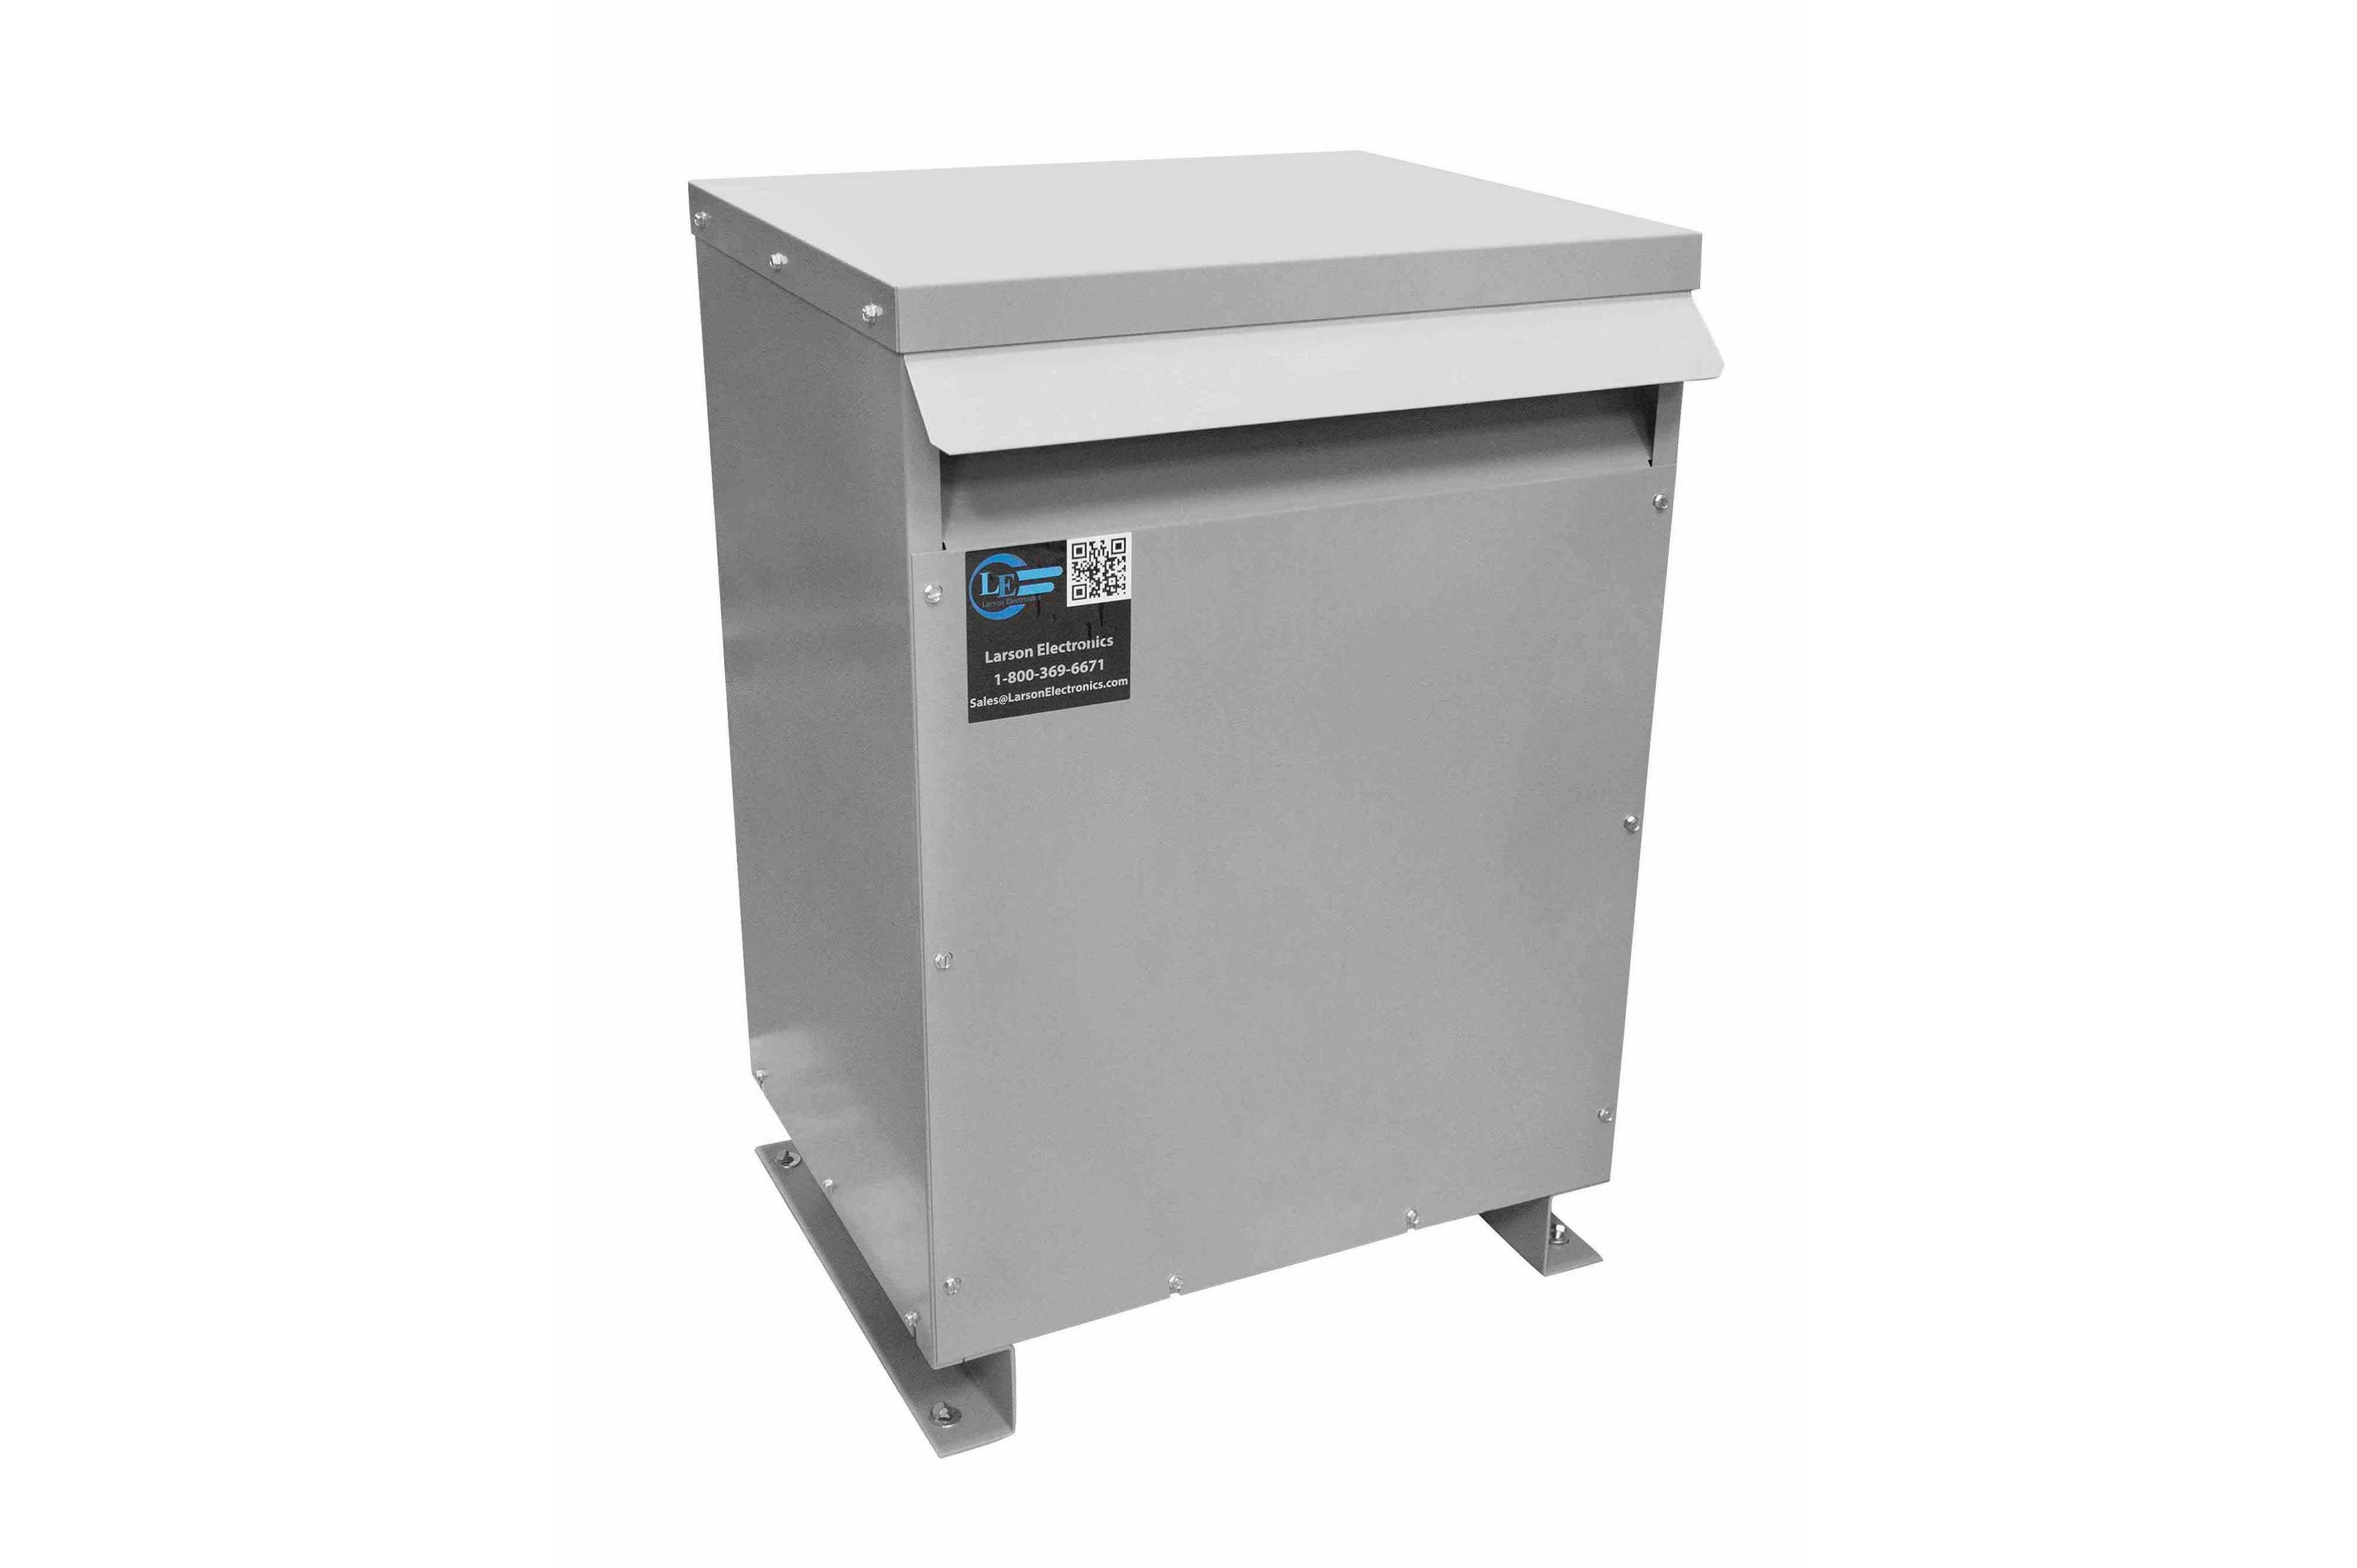 18 kVA 3PH Isolation Transformer, 208V Wye Primary, 380Y/220 Wye-N Secondary, N3R, Ventilated, 60 Hz